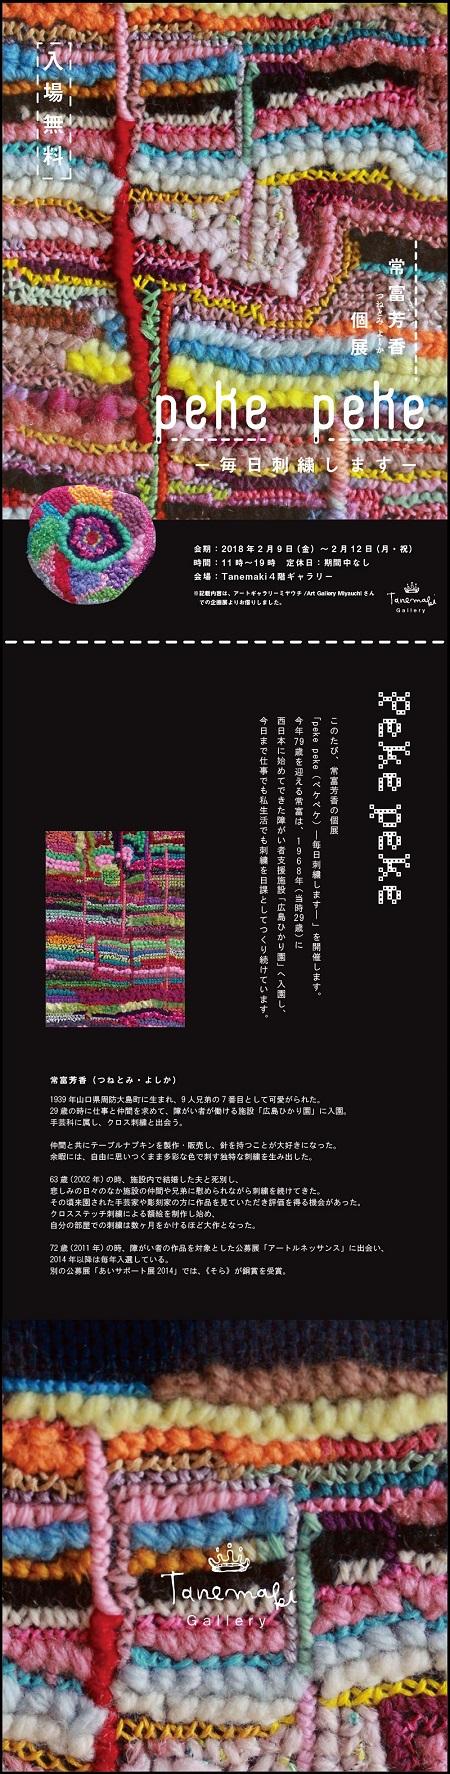 yoshikasanshuusei.jpg